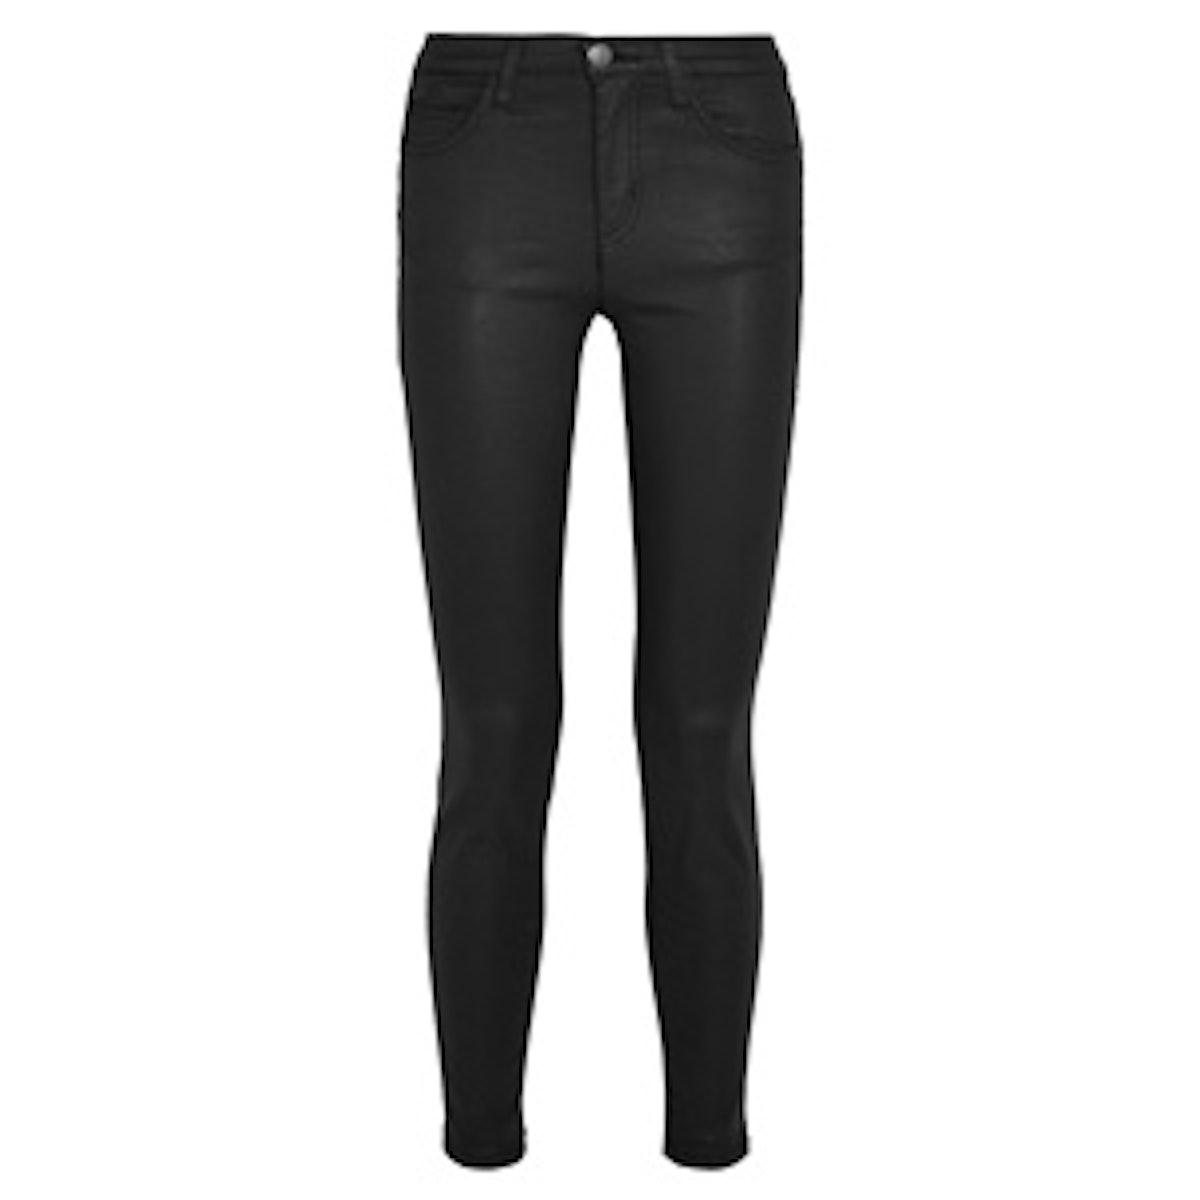 The High Waist Coated Skinny Jeans